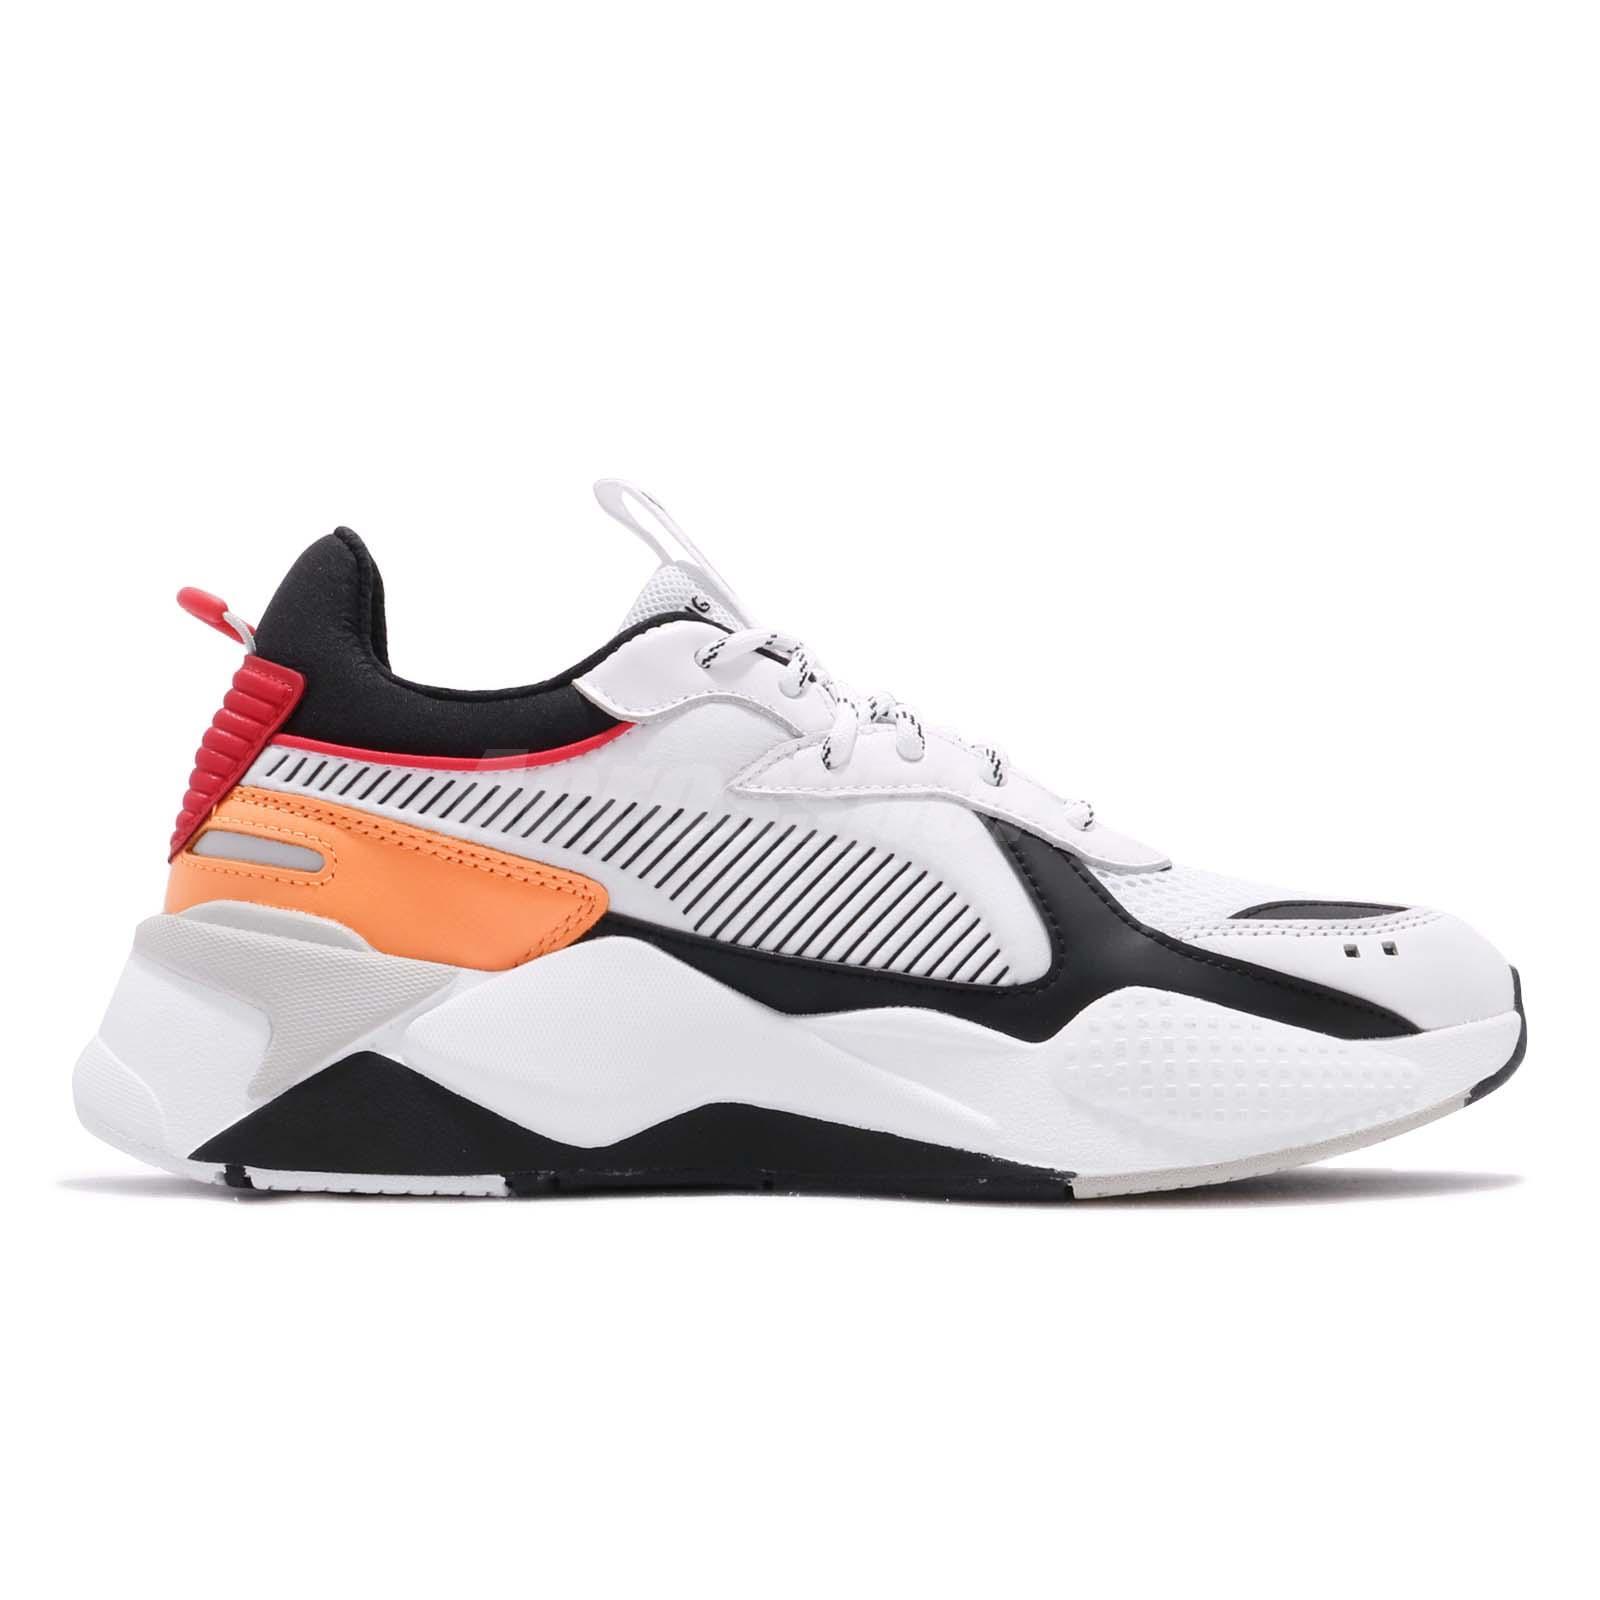 Details about Puma RS-X Tracks Running System White Black Red Orange Men  Shoe Sneaker 36933202